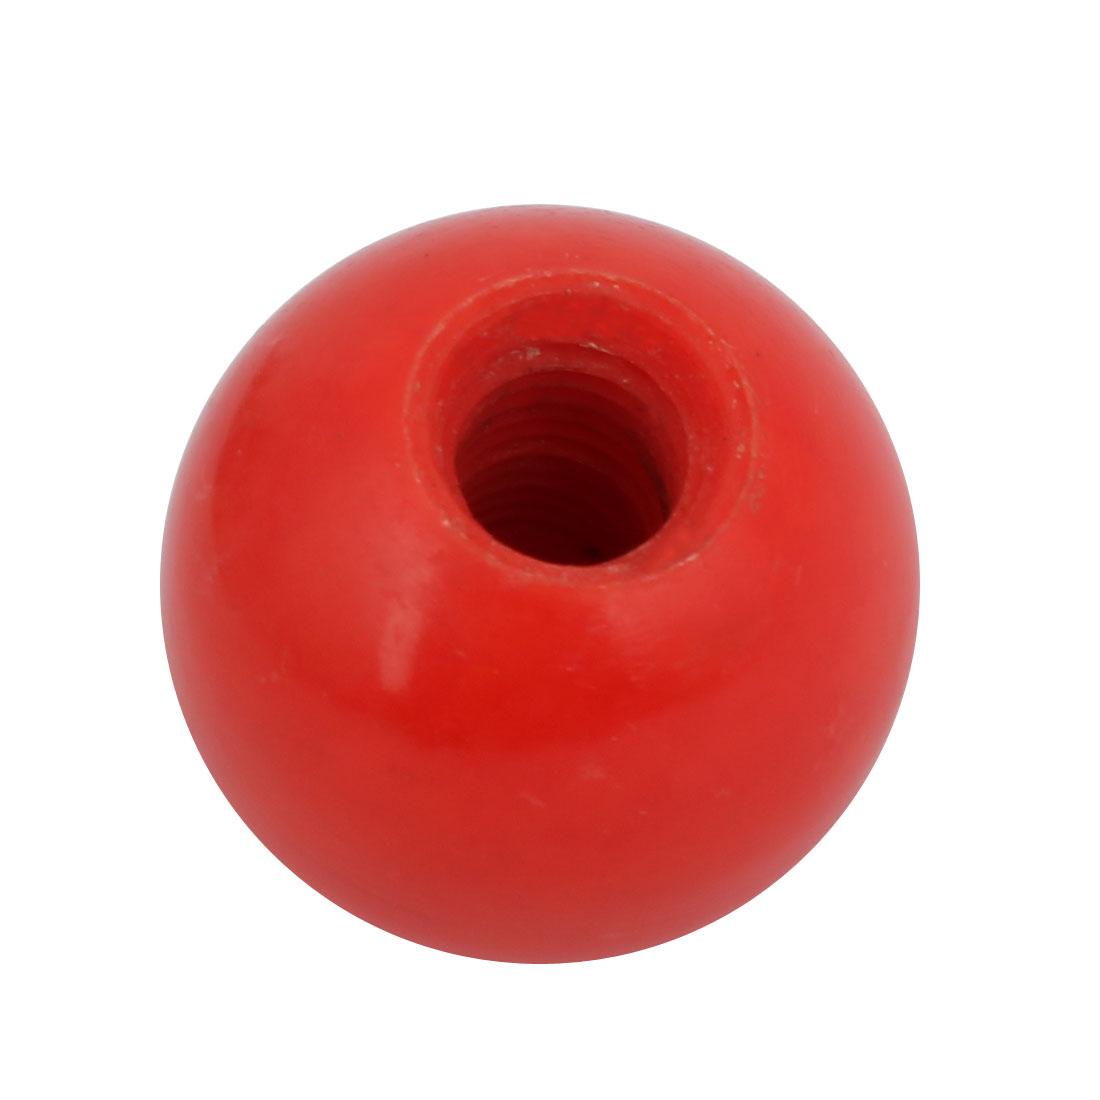 32mm Dia M10 Female Threaded Plastic Round Handle Ball Knob Red